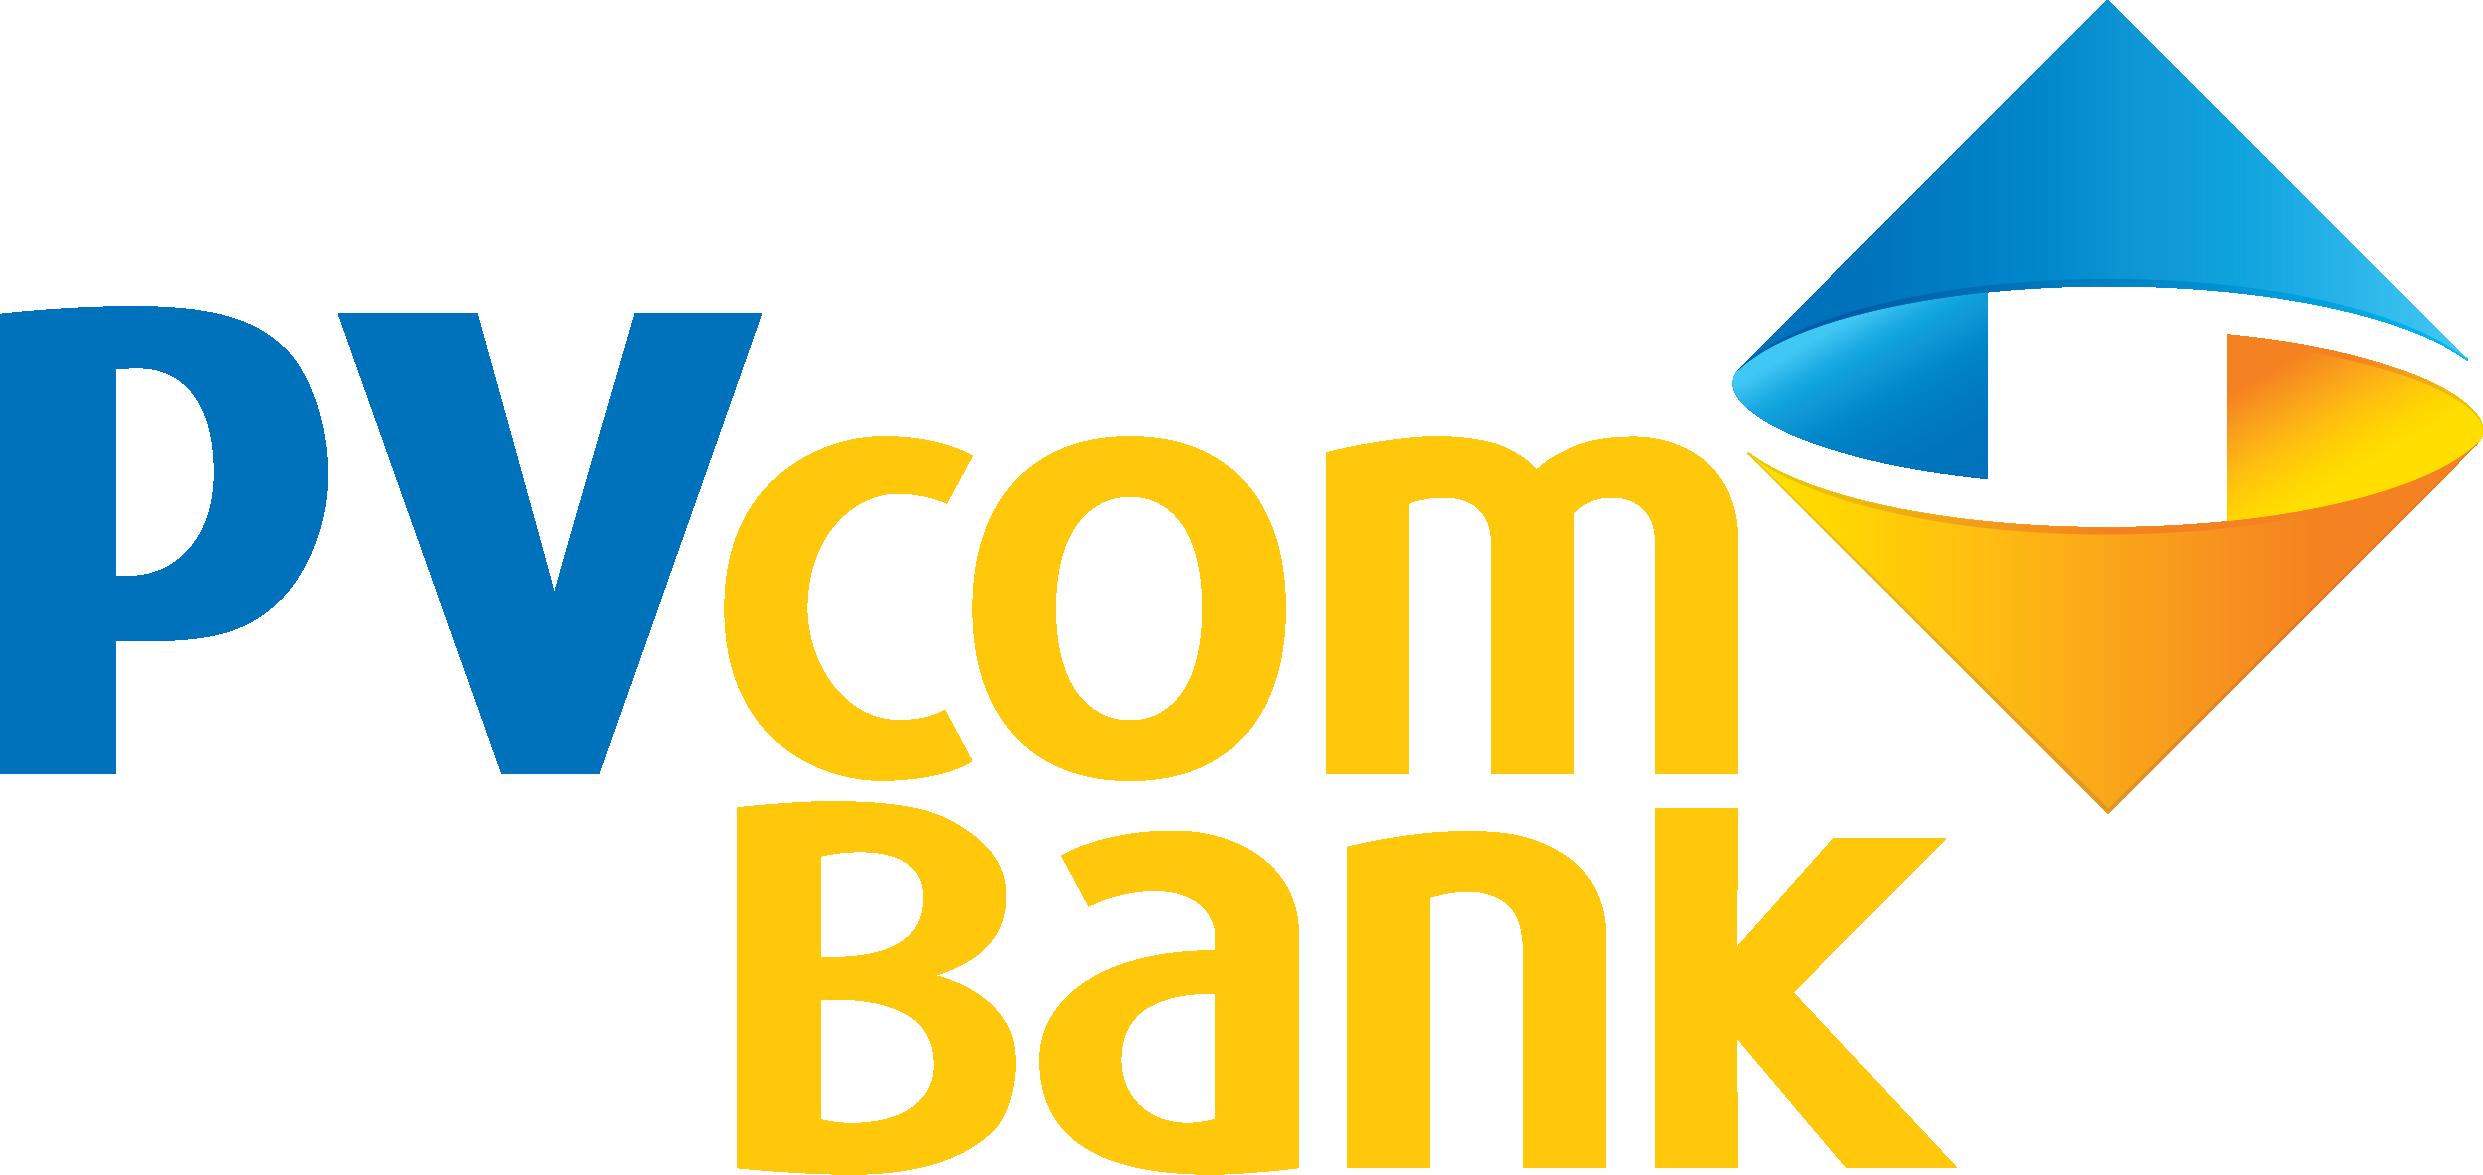 PVcomBank logo